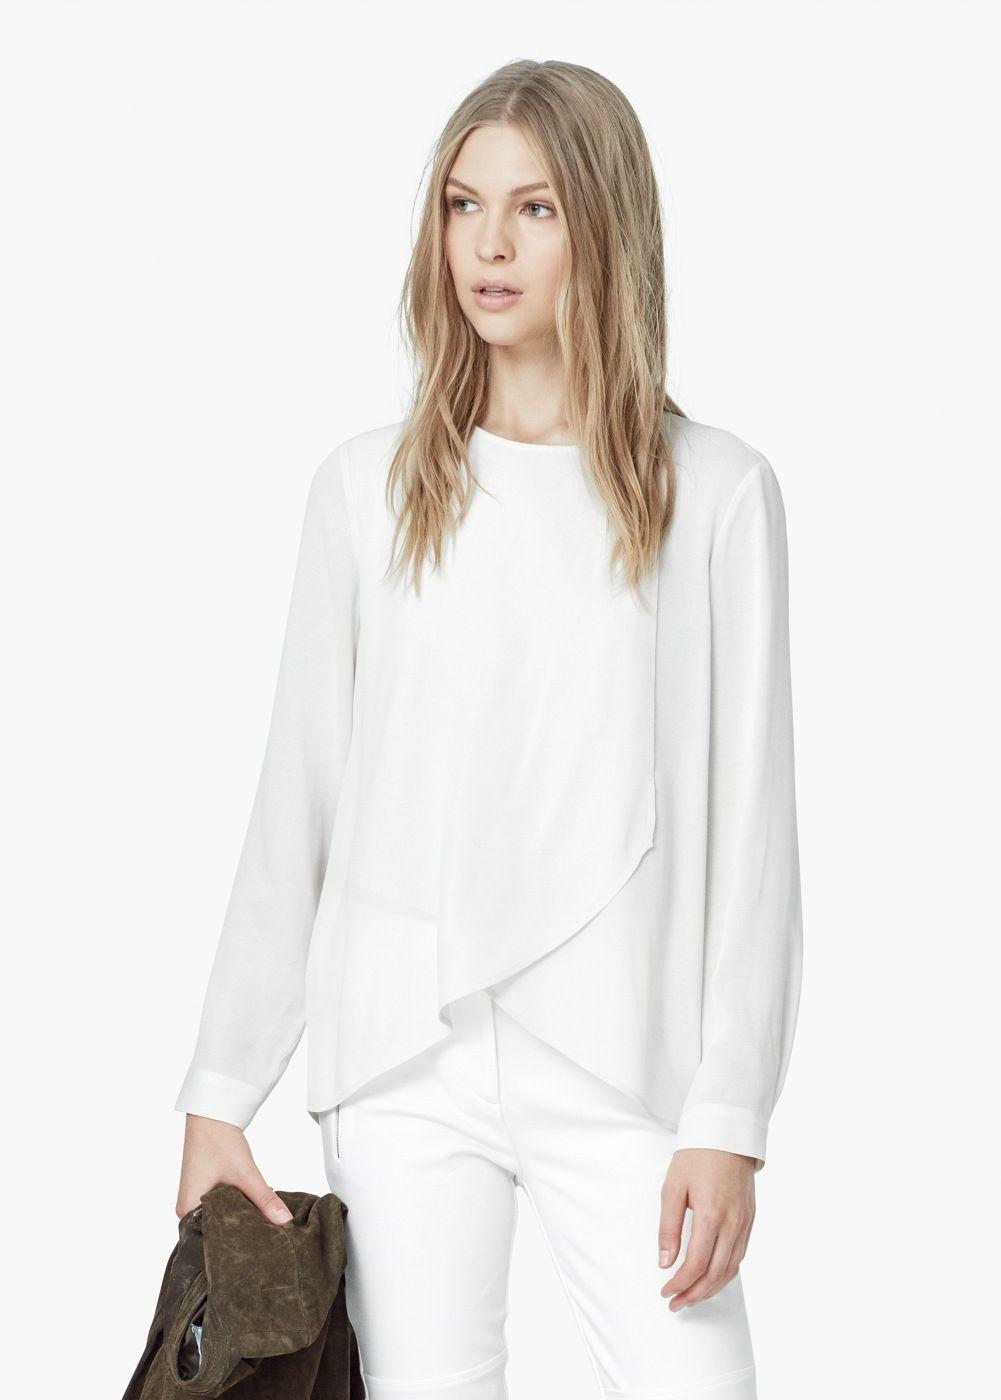 Blusa cruzada | For women, Wraps and Shirts